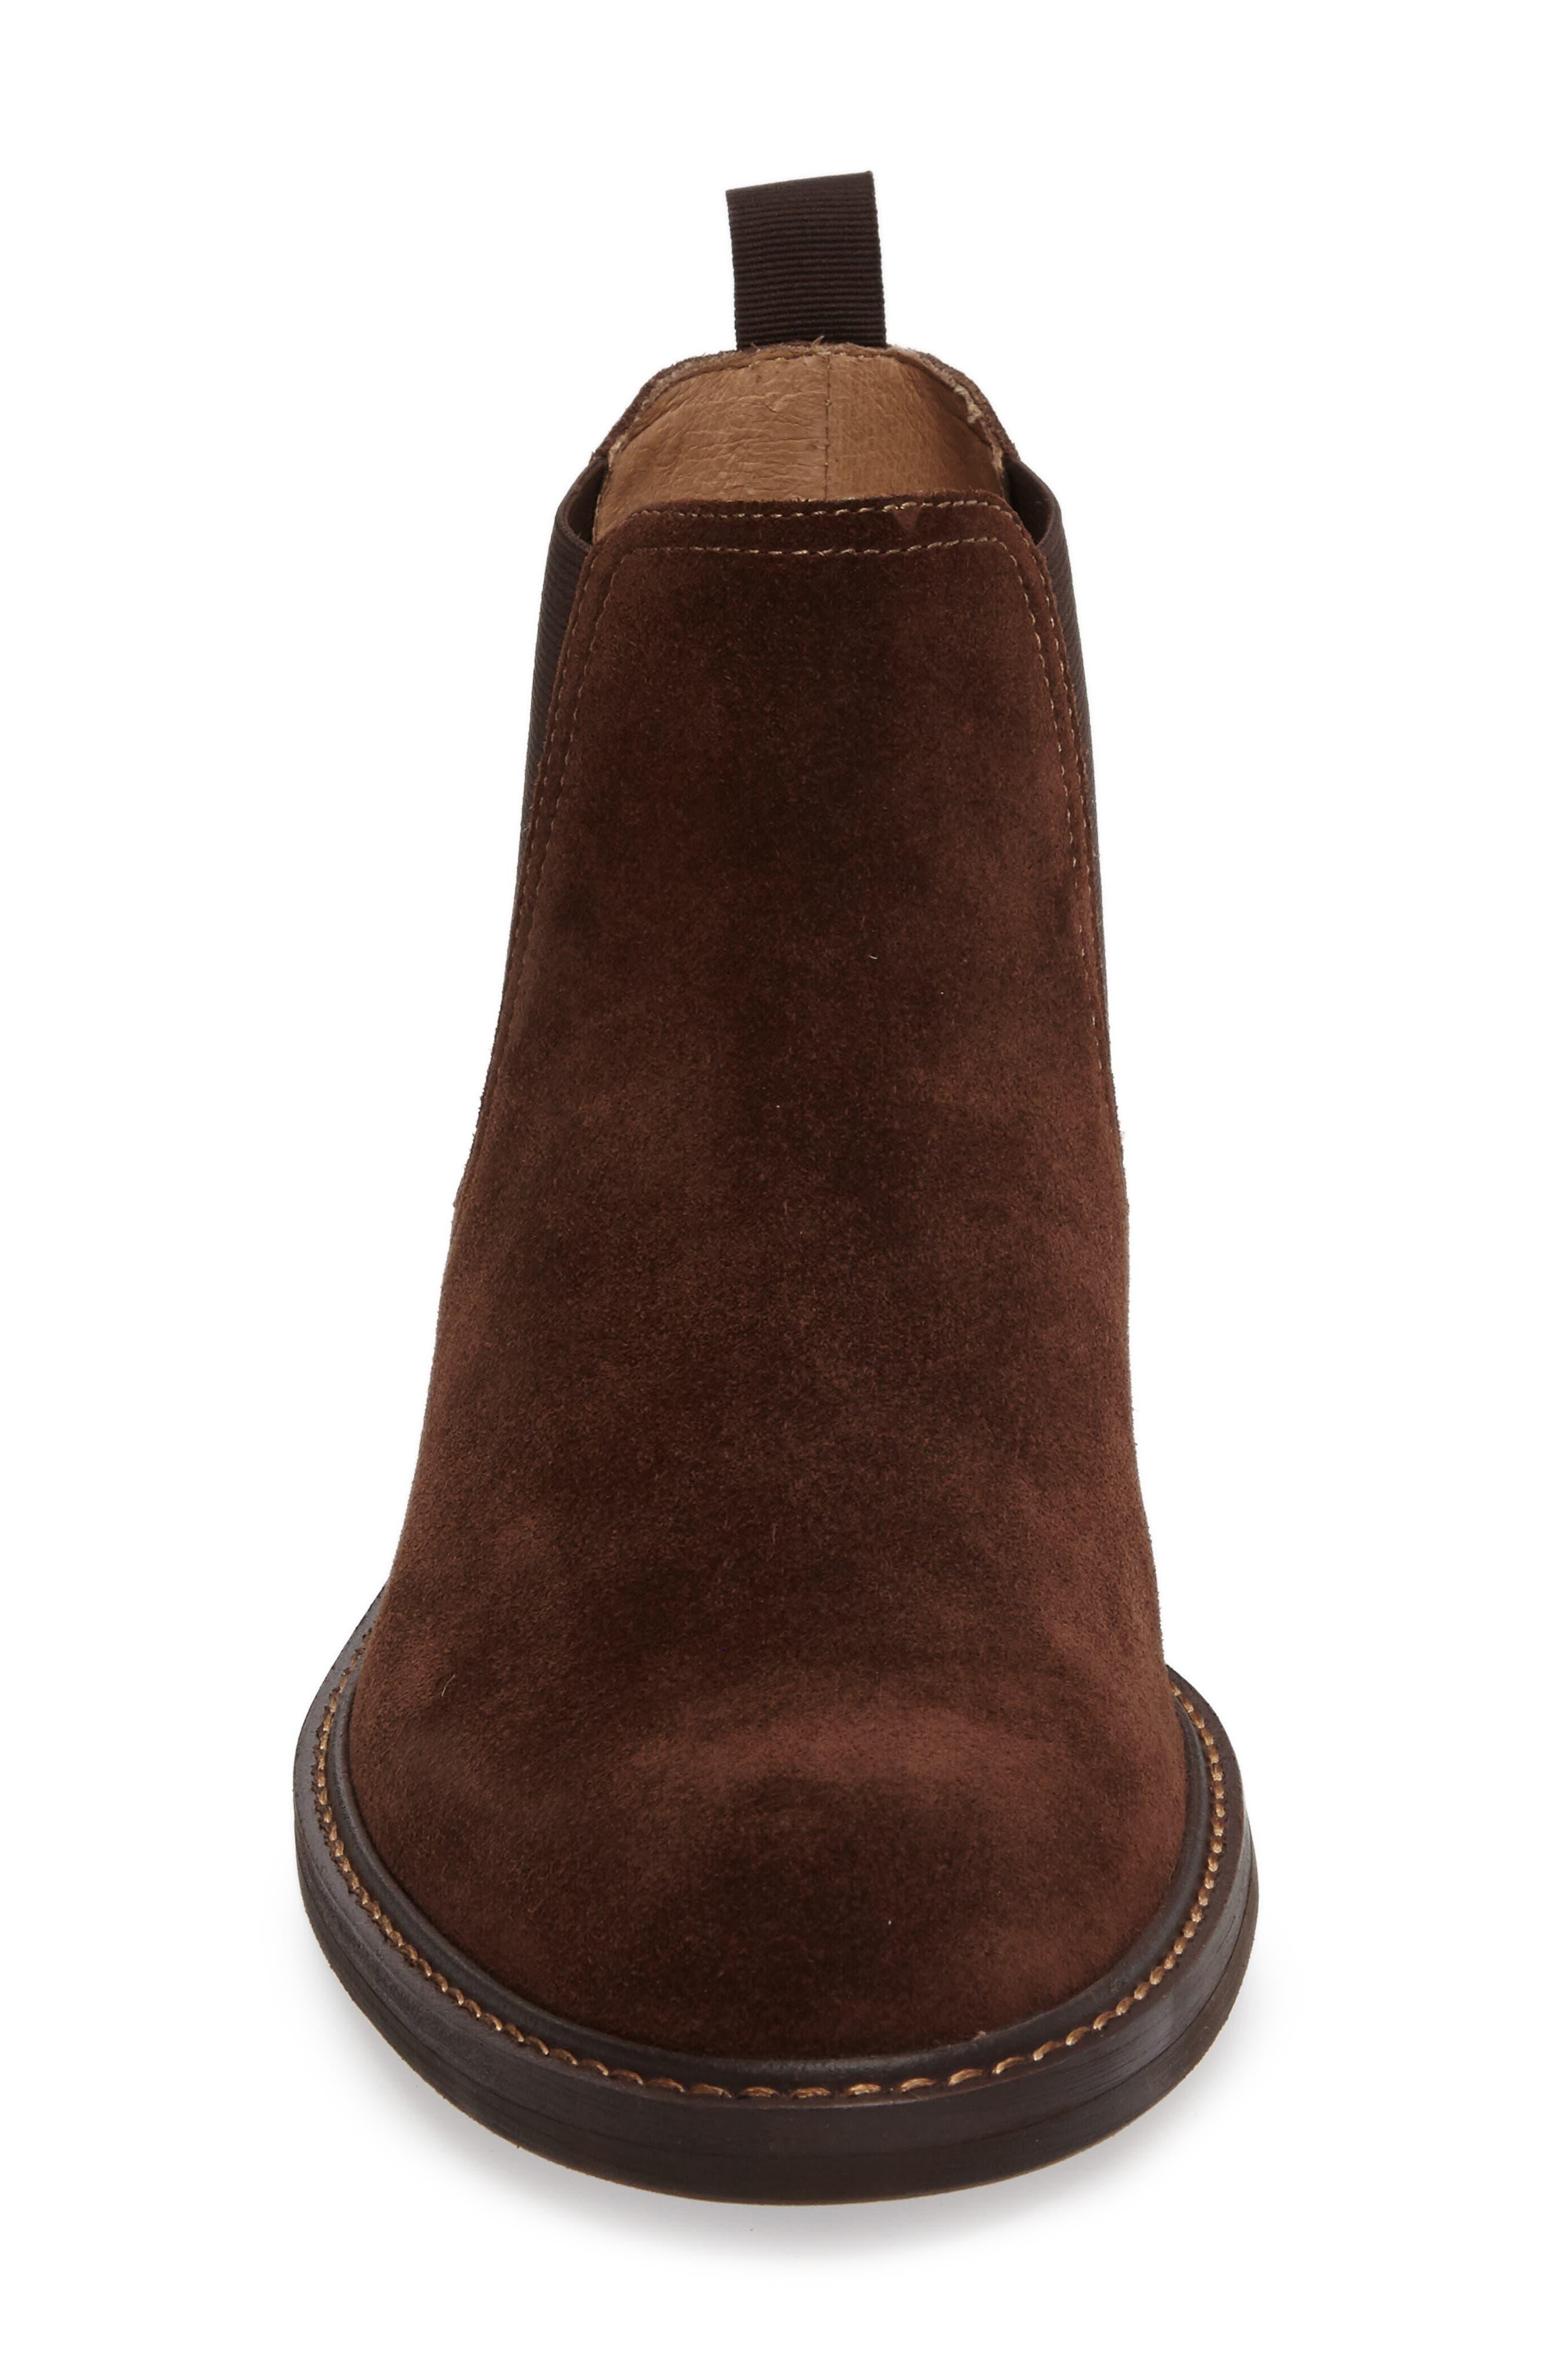 Horton Chelsea Boot,                             Alternate thumbnail 34, color,